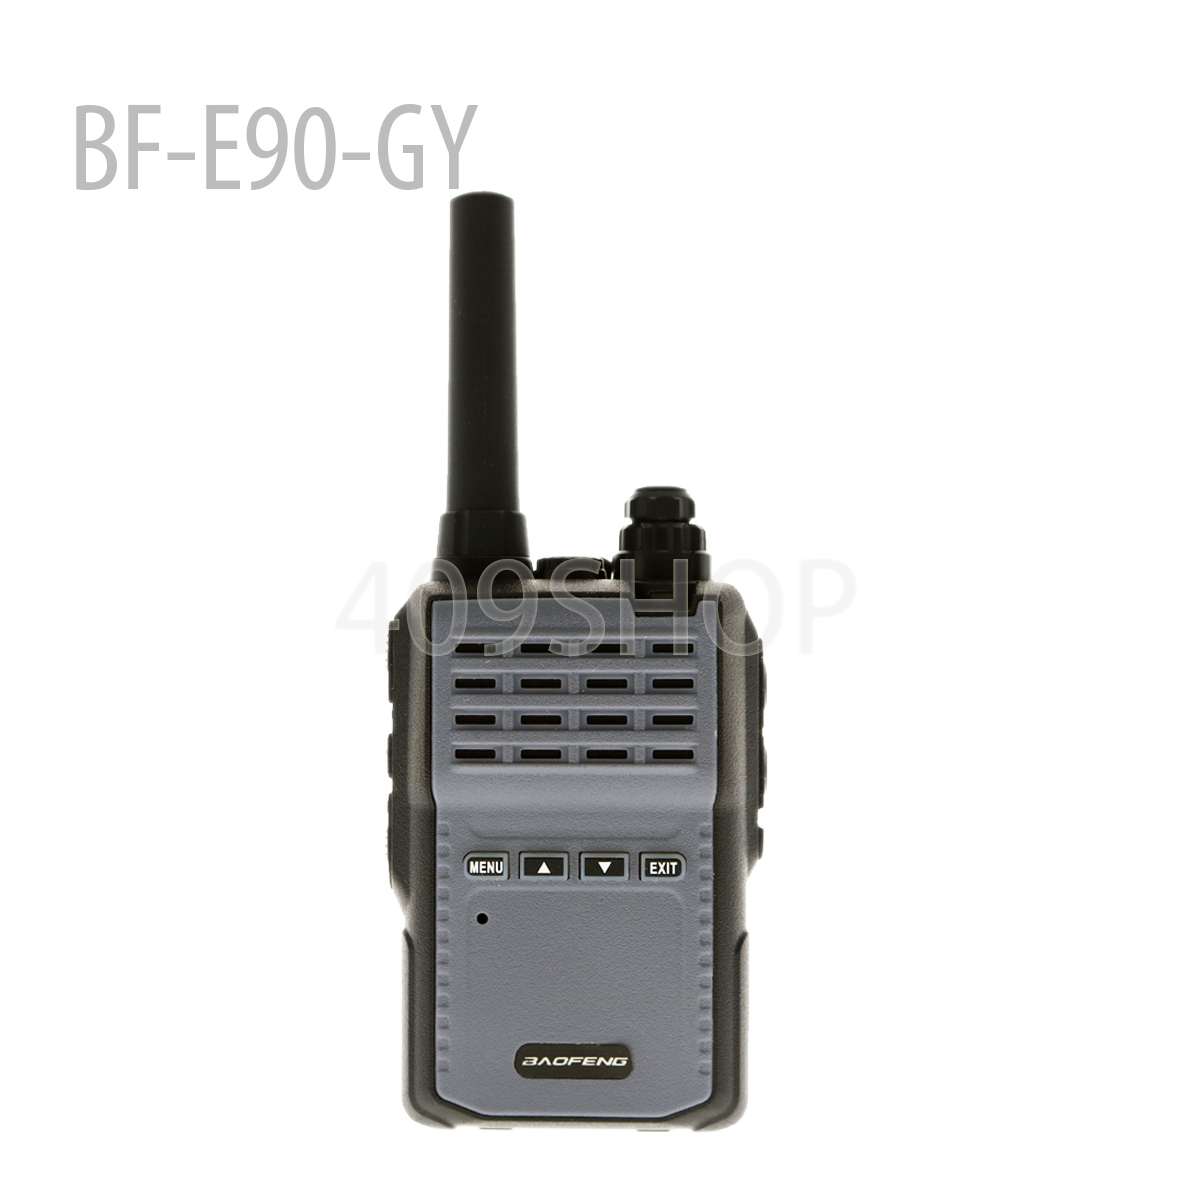 BAOFENG BF-E90-GY Mini Two Way Radio UHF 400-470 MHZGrey